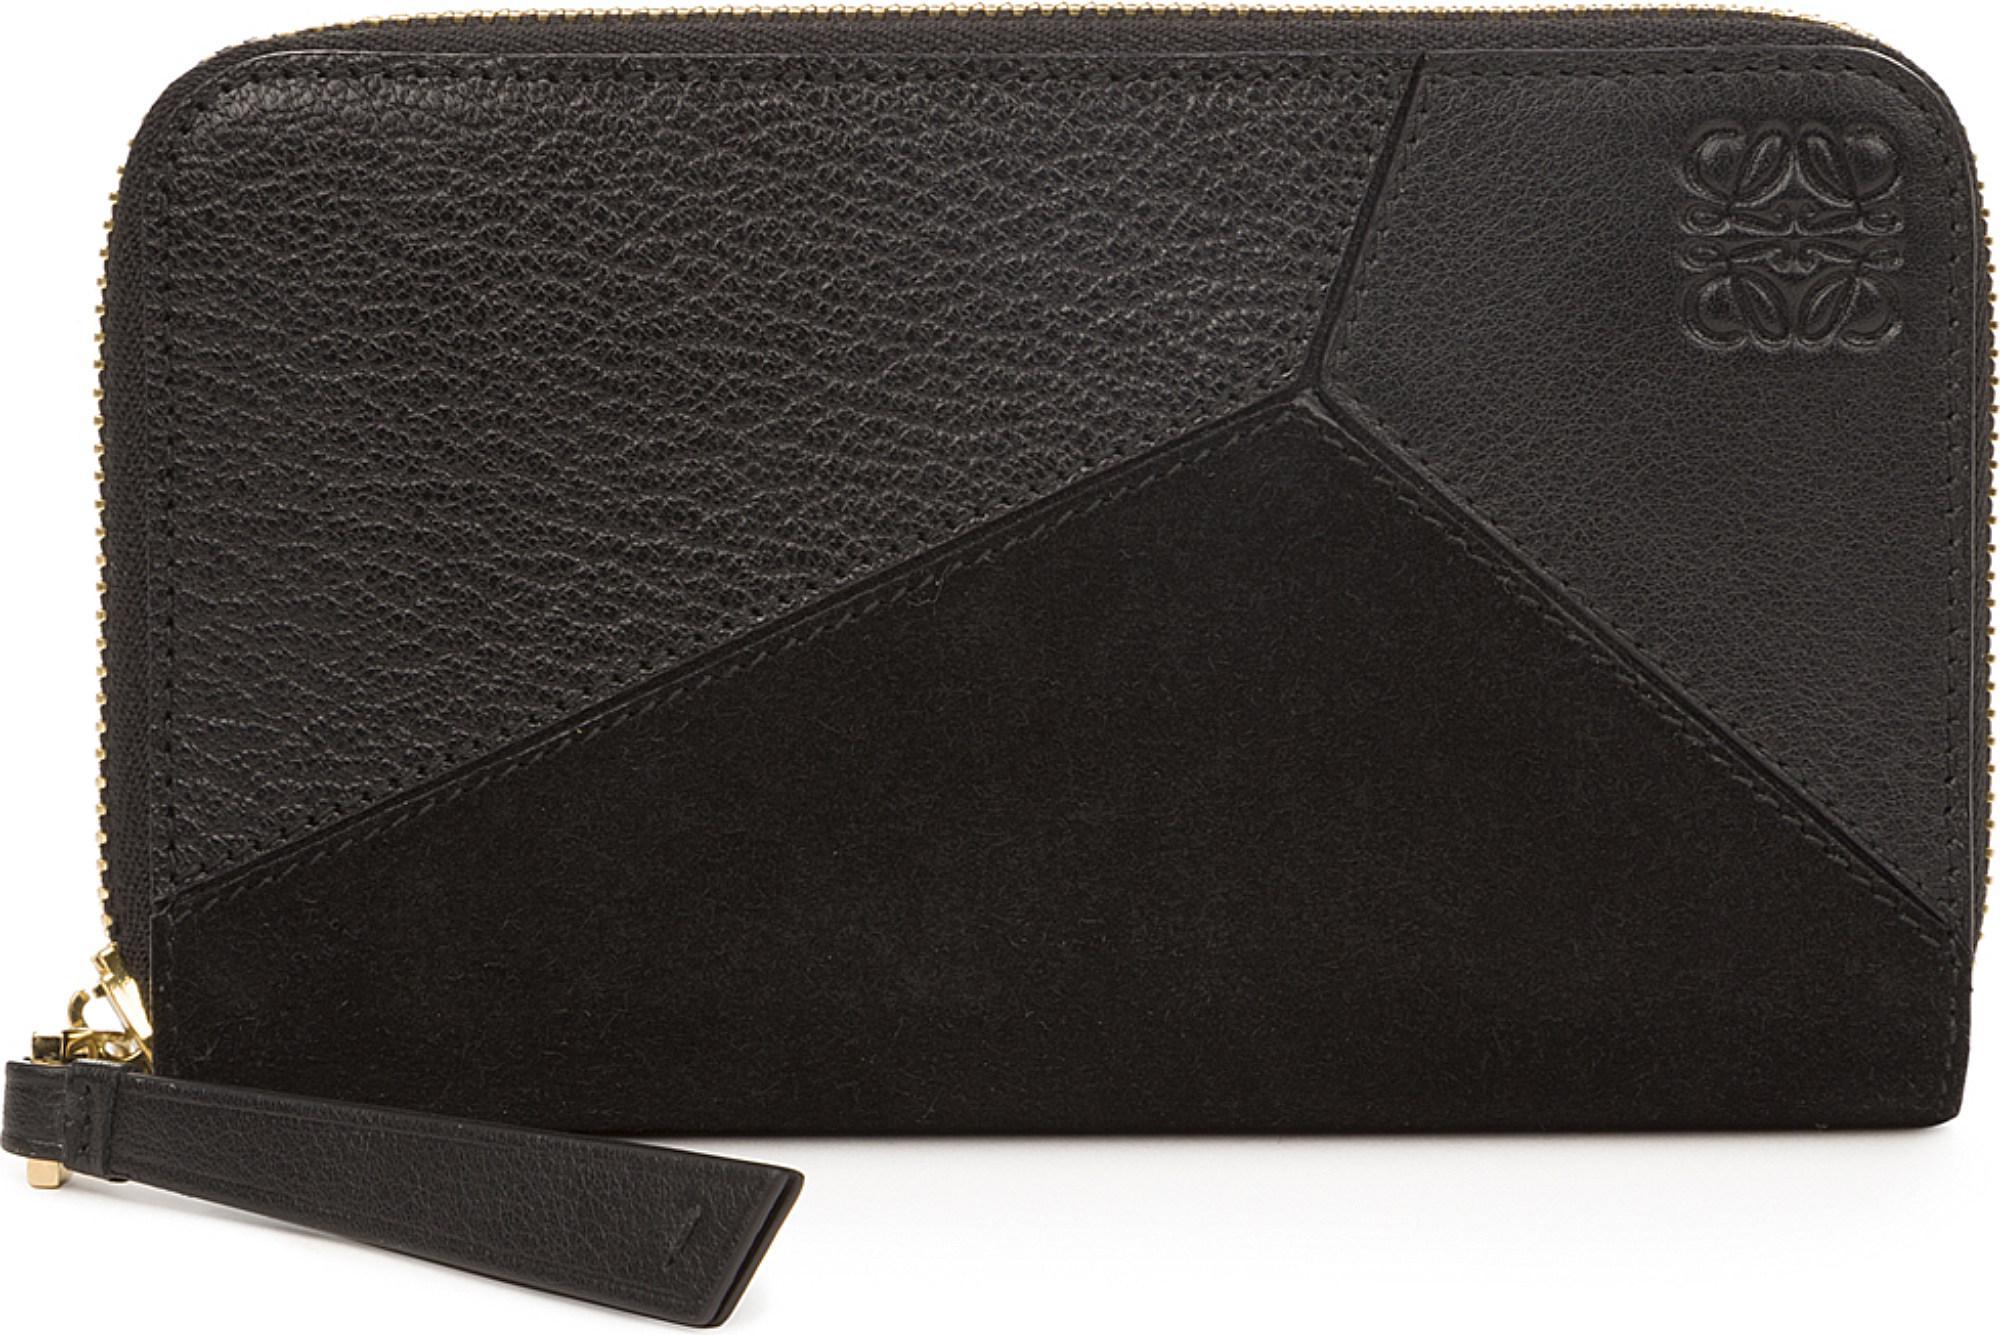 Medium Zip Around Wallet Loewe O4Tns